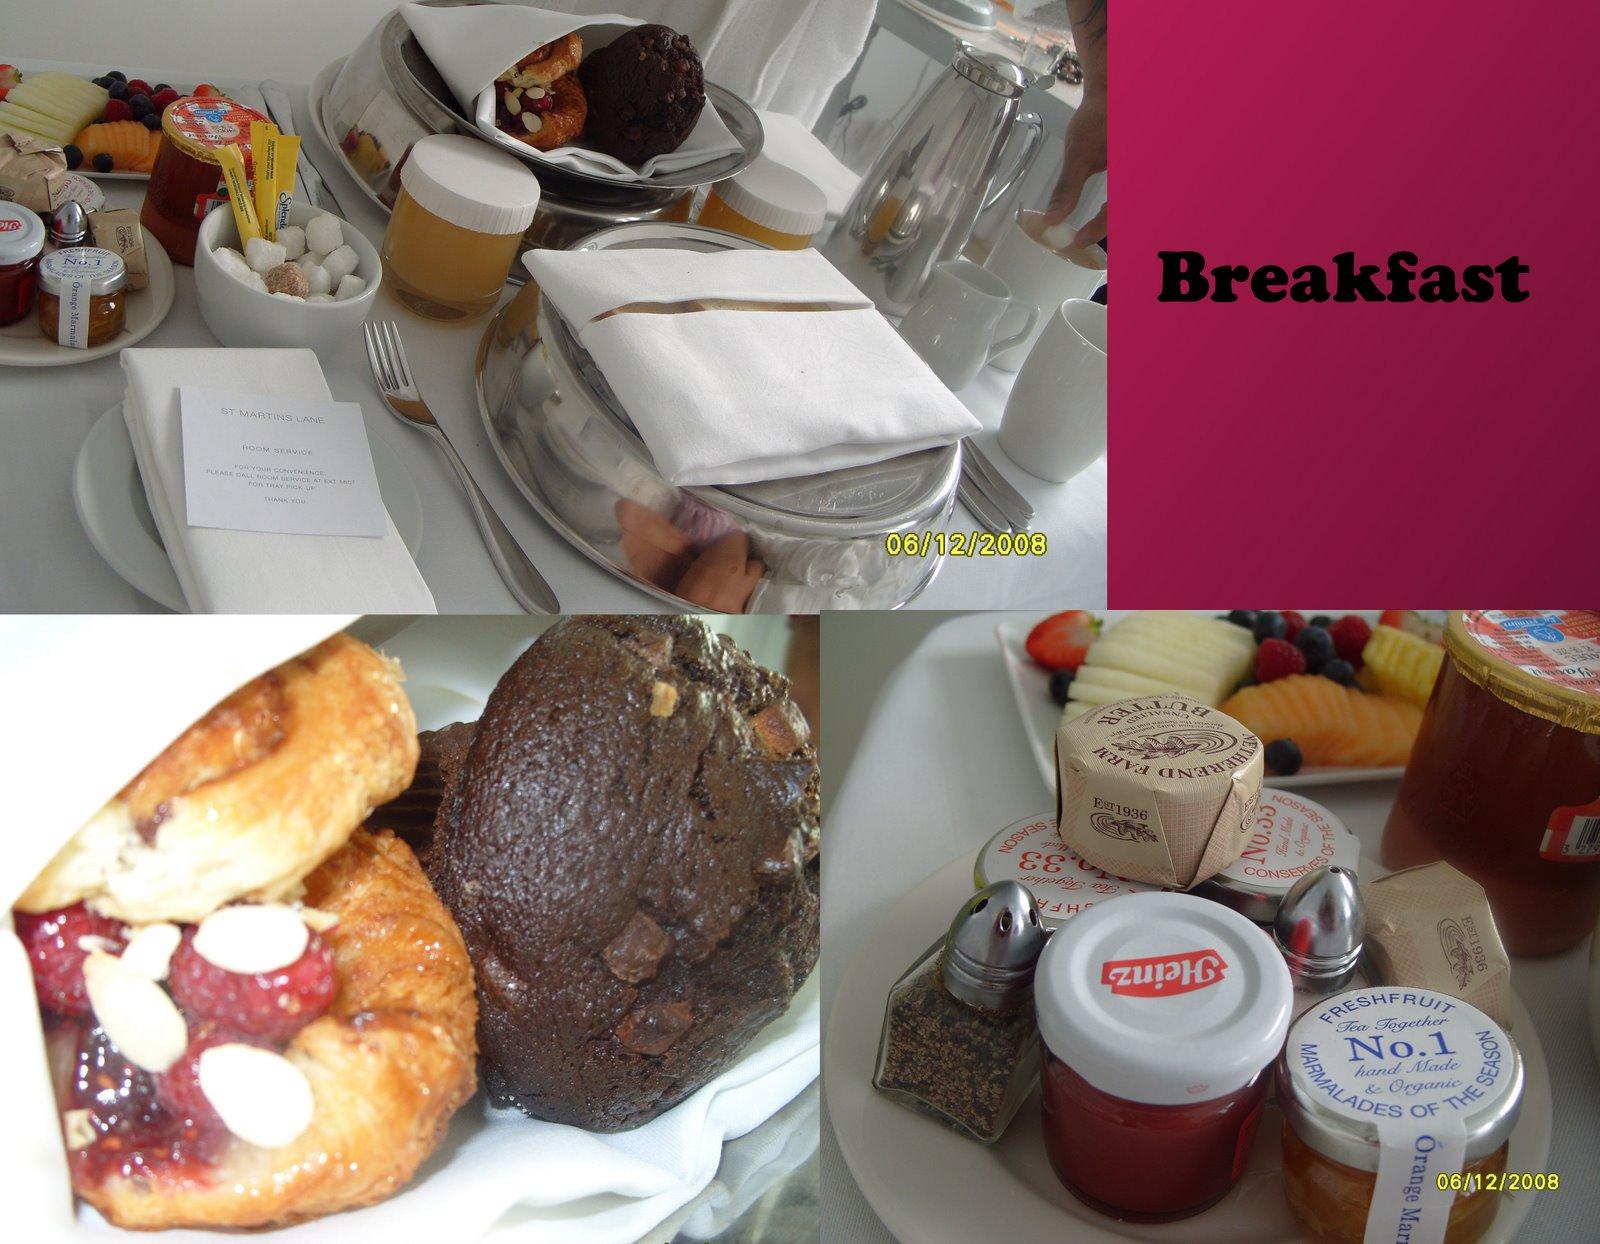 breakfast room service at St Martin's Lane Hotel